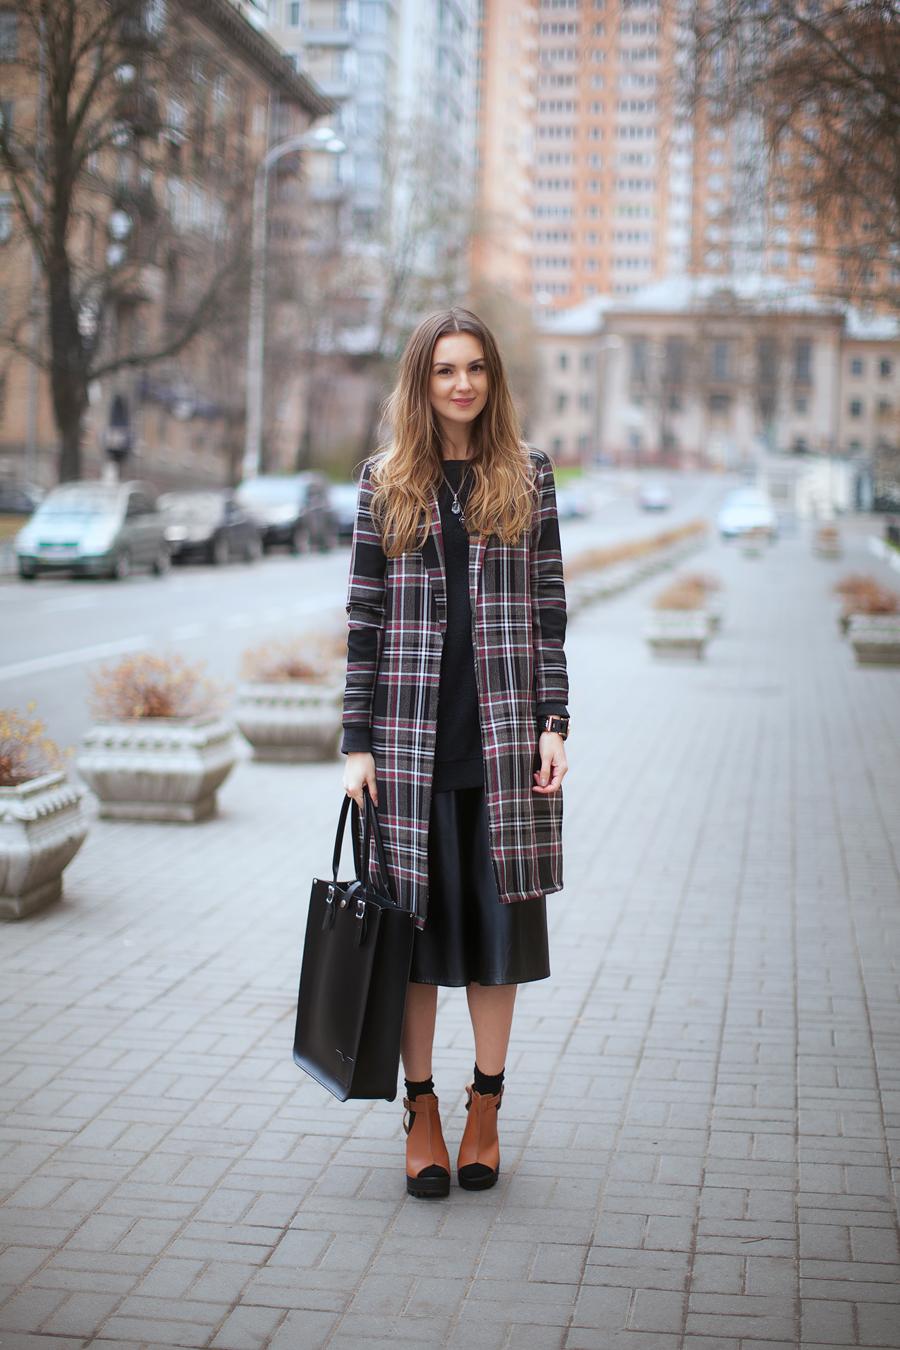 street-style-plaid-coat-midi-skirt-outfit